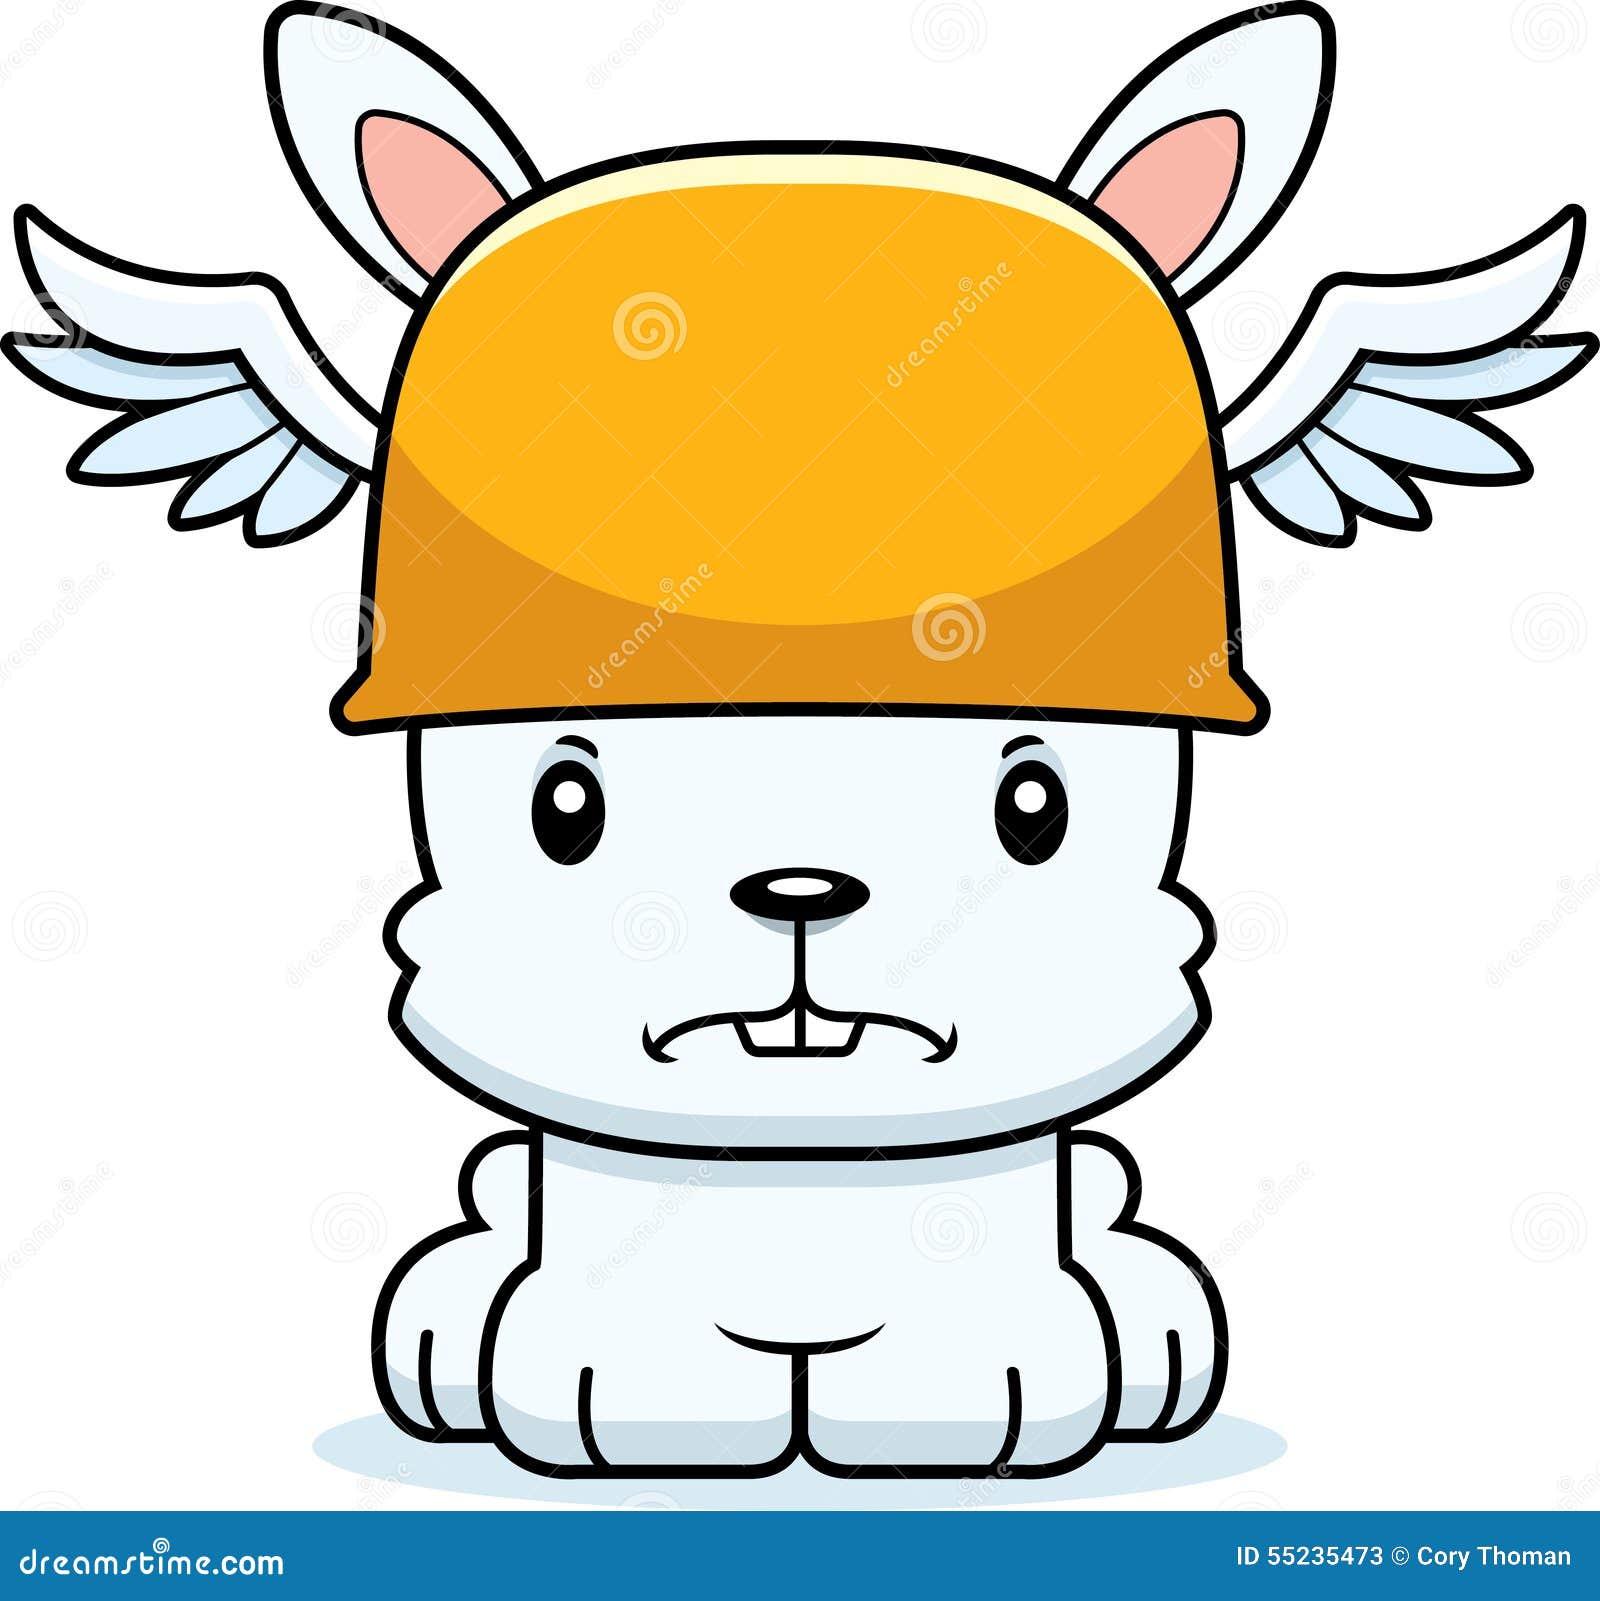 Cartoon Angry Hermes Bunny stock vector. Image of ...